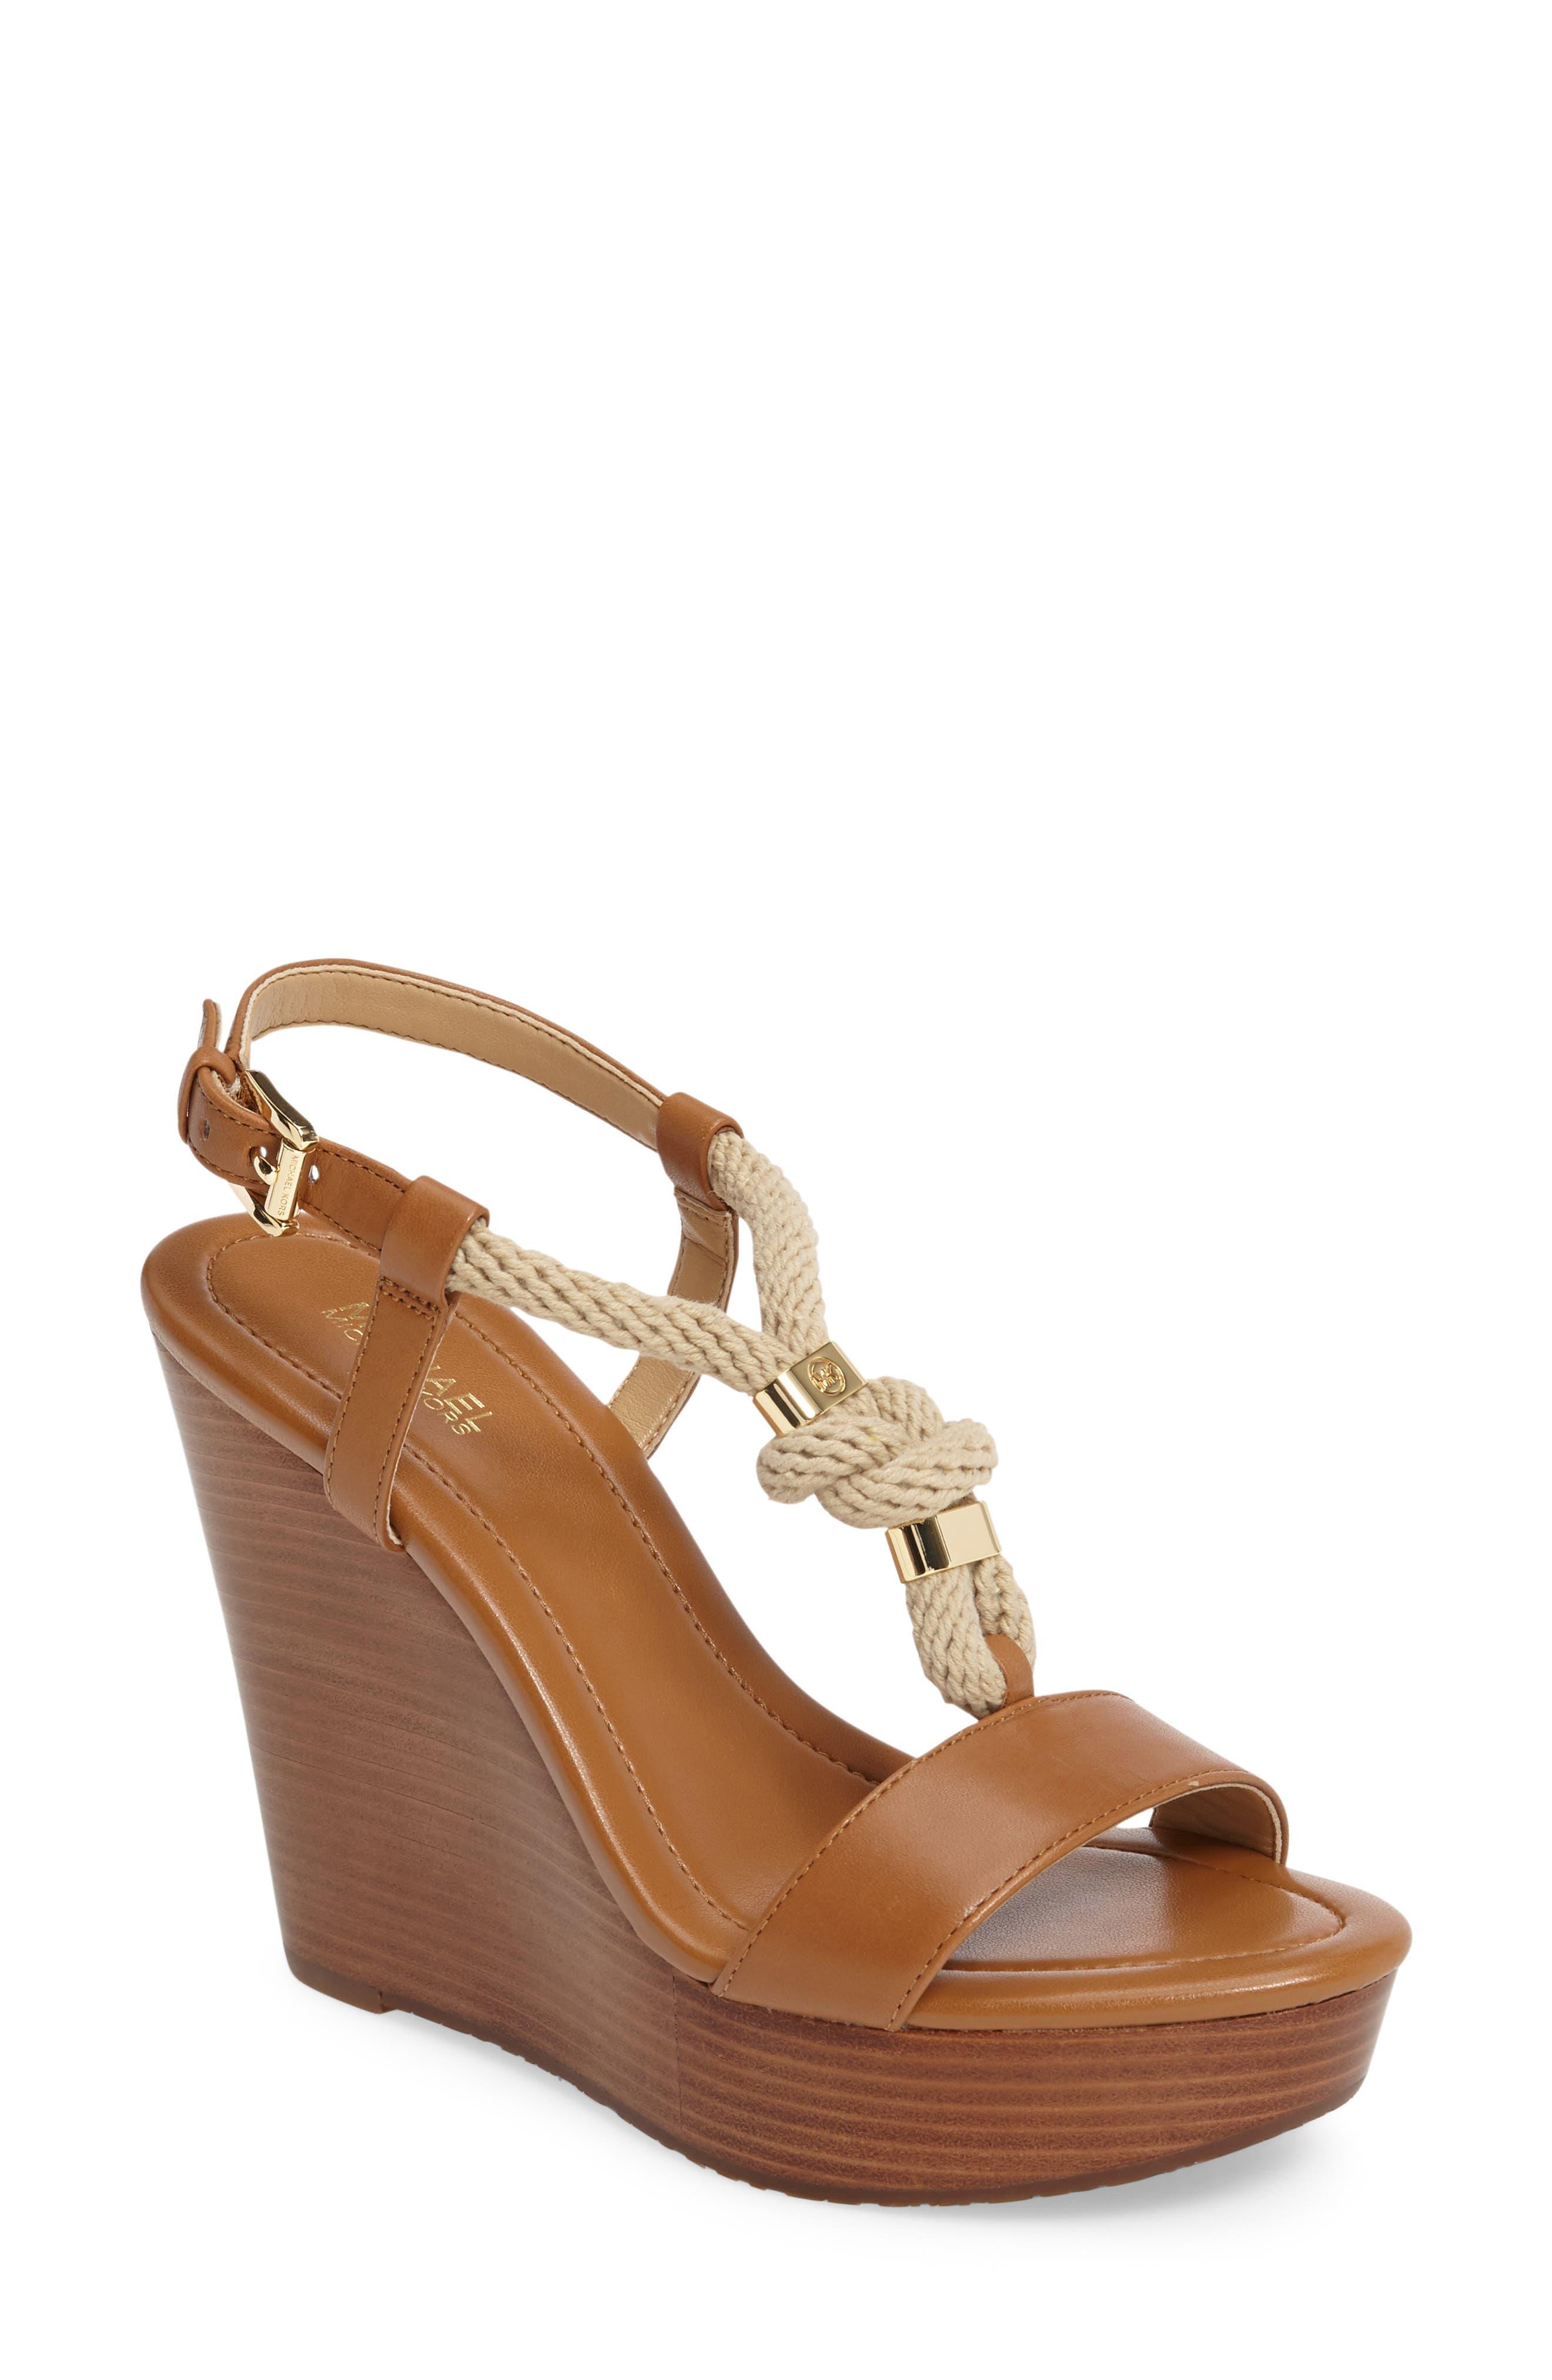 Main Image - MICHAEL Michael Kors 'Holly' Espadrille Wedge Sandal (Women)